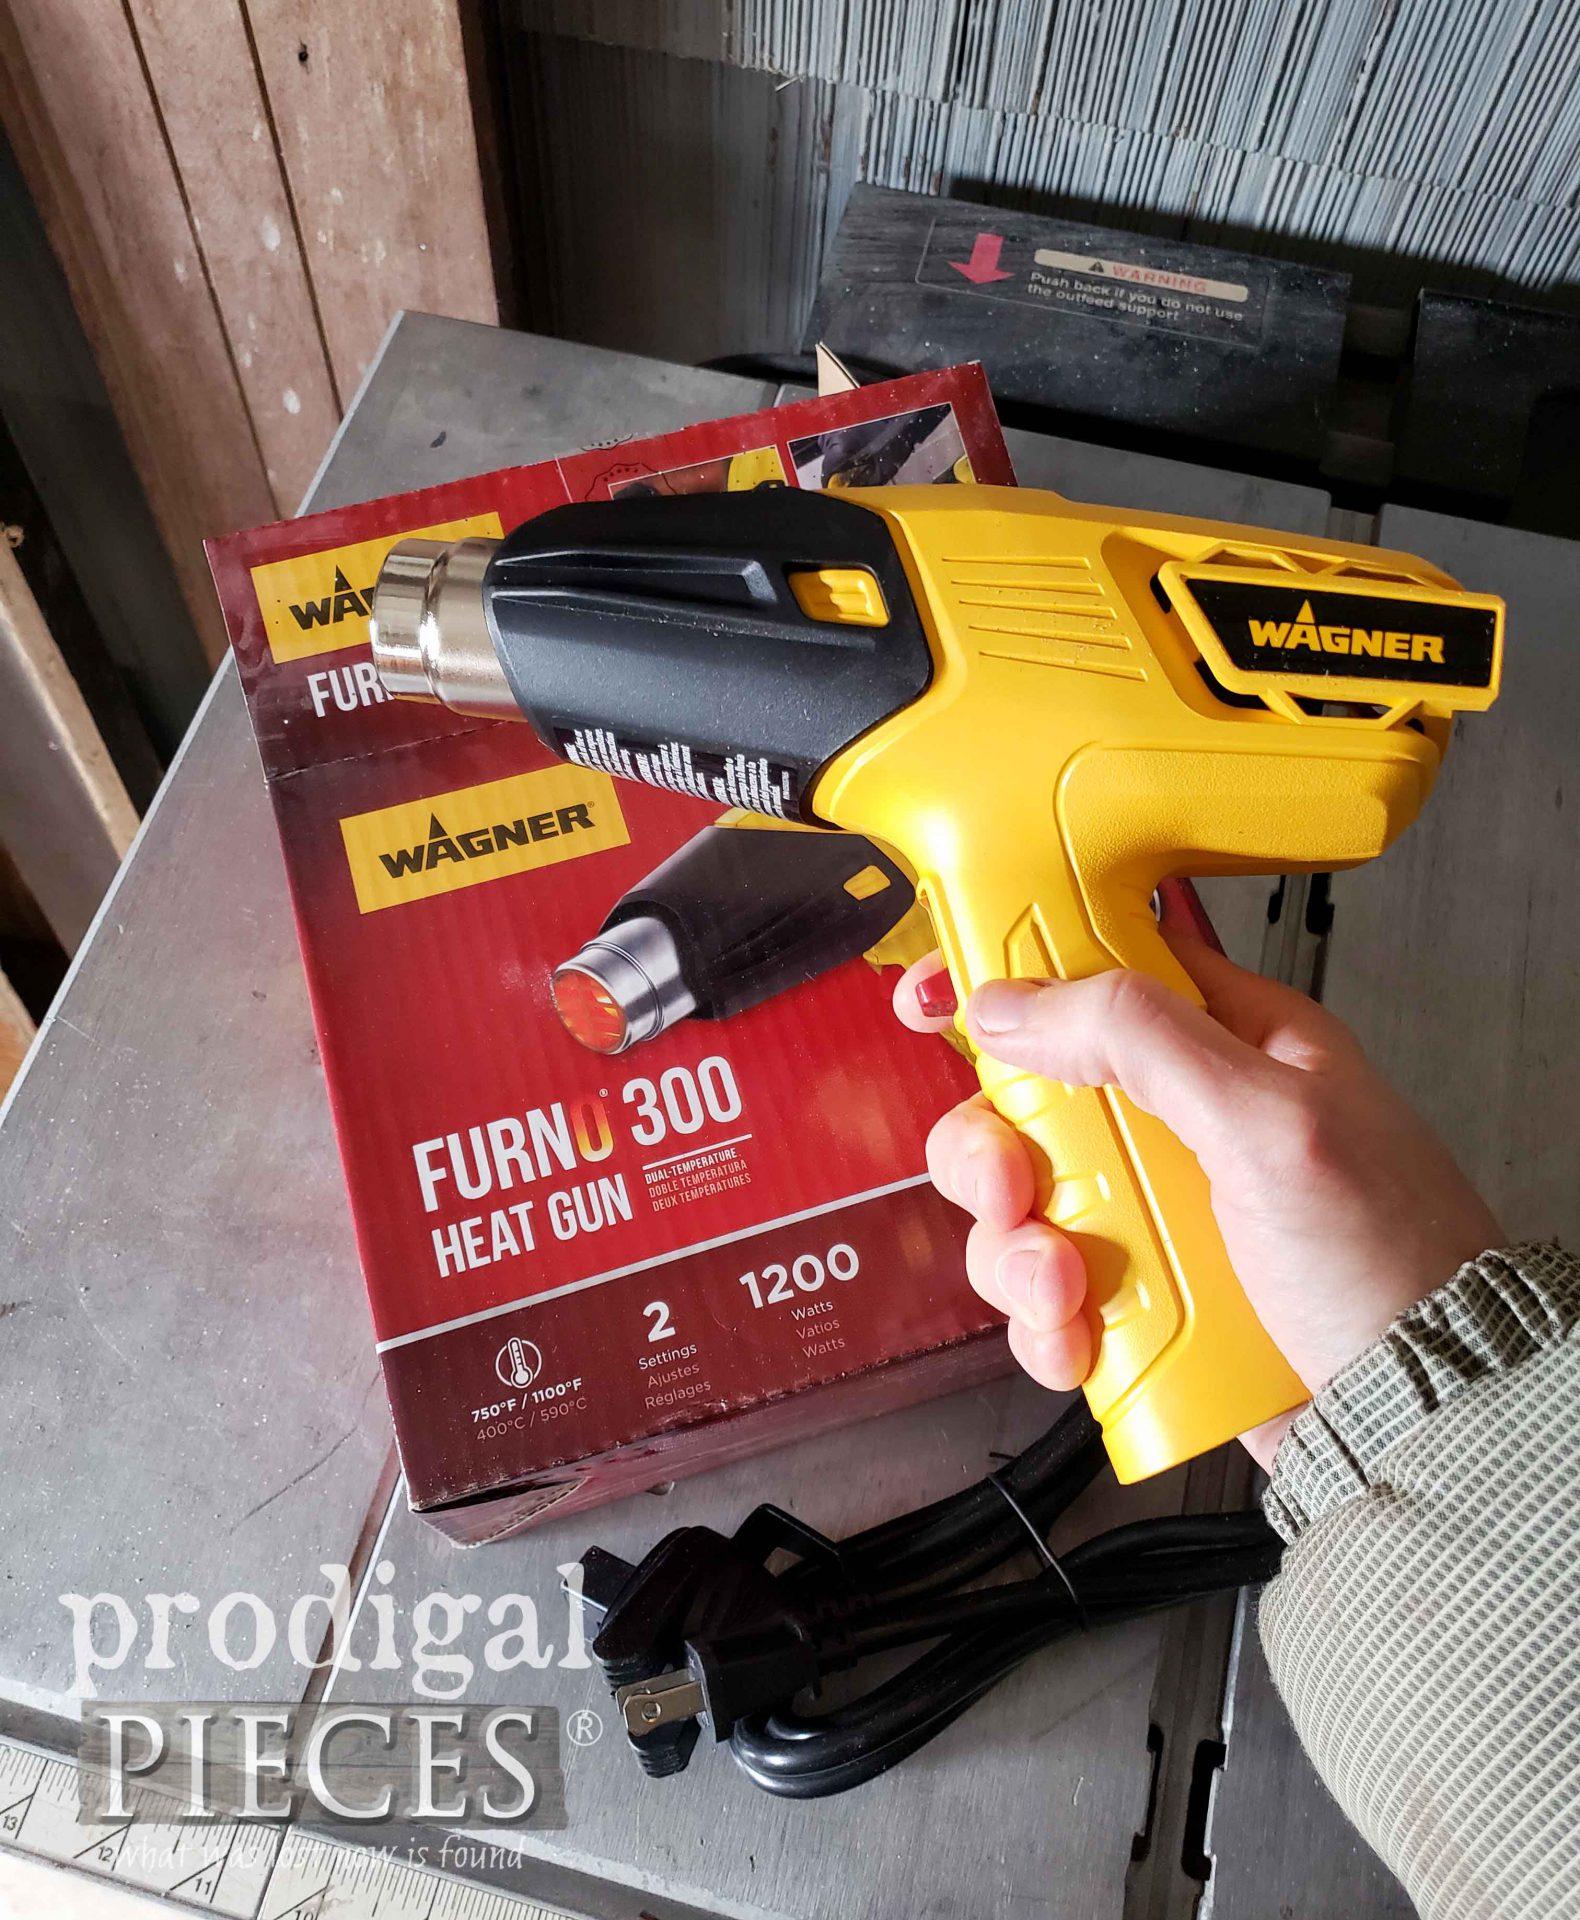 Wagner Heat Gun | prodigalpieces.com